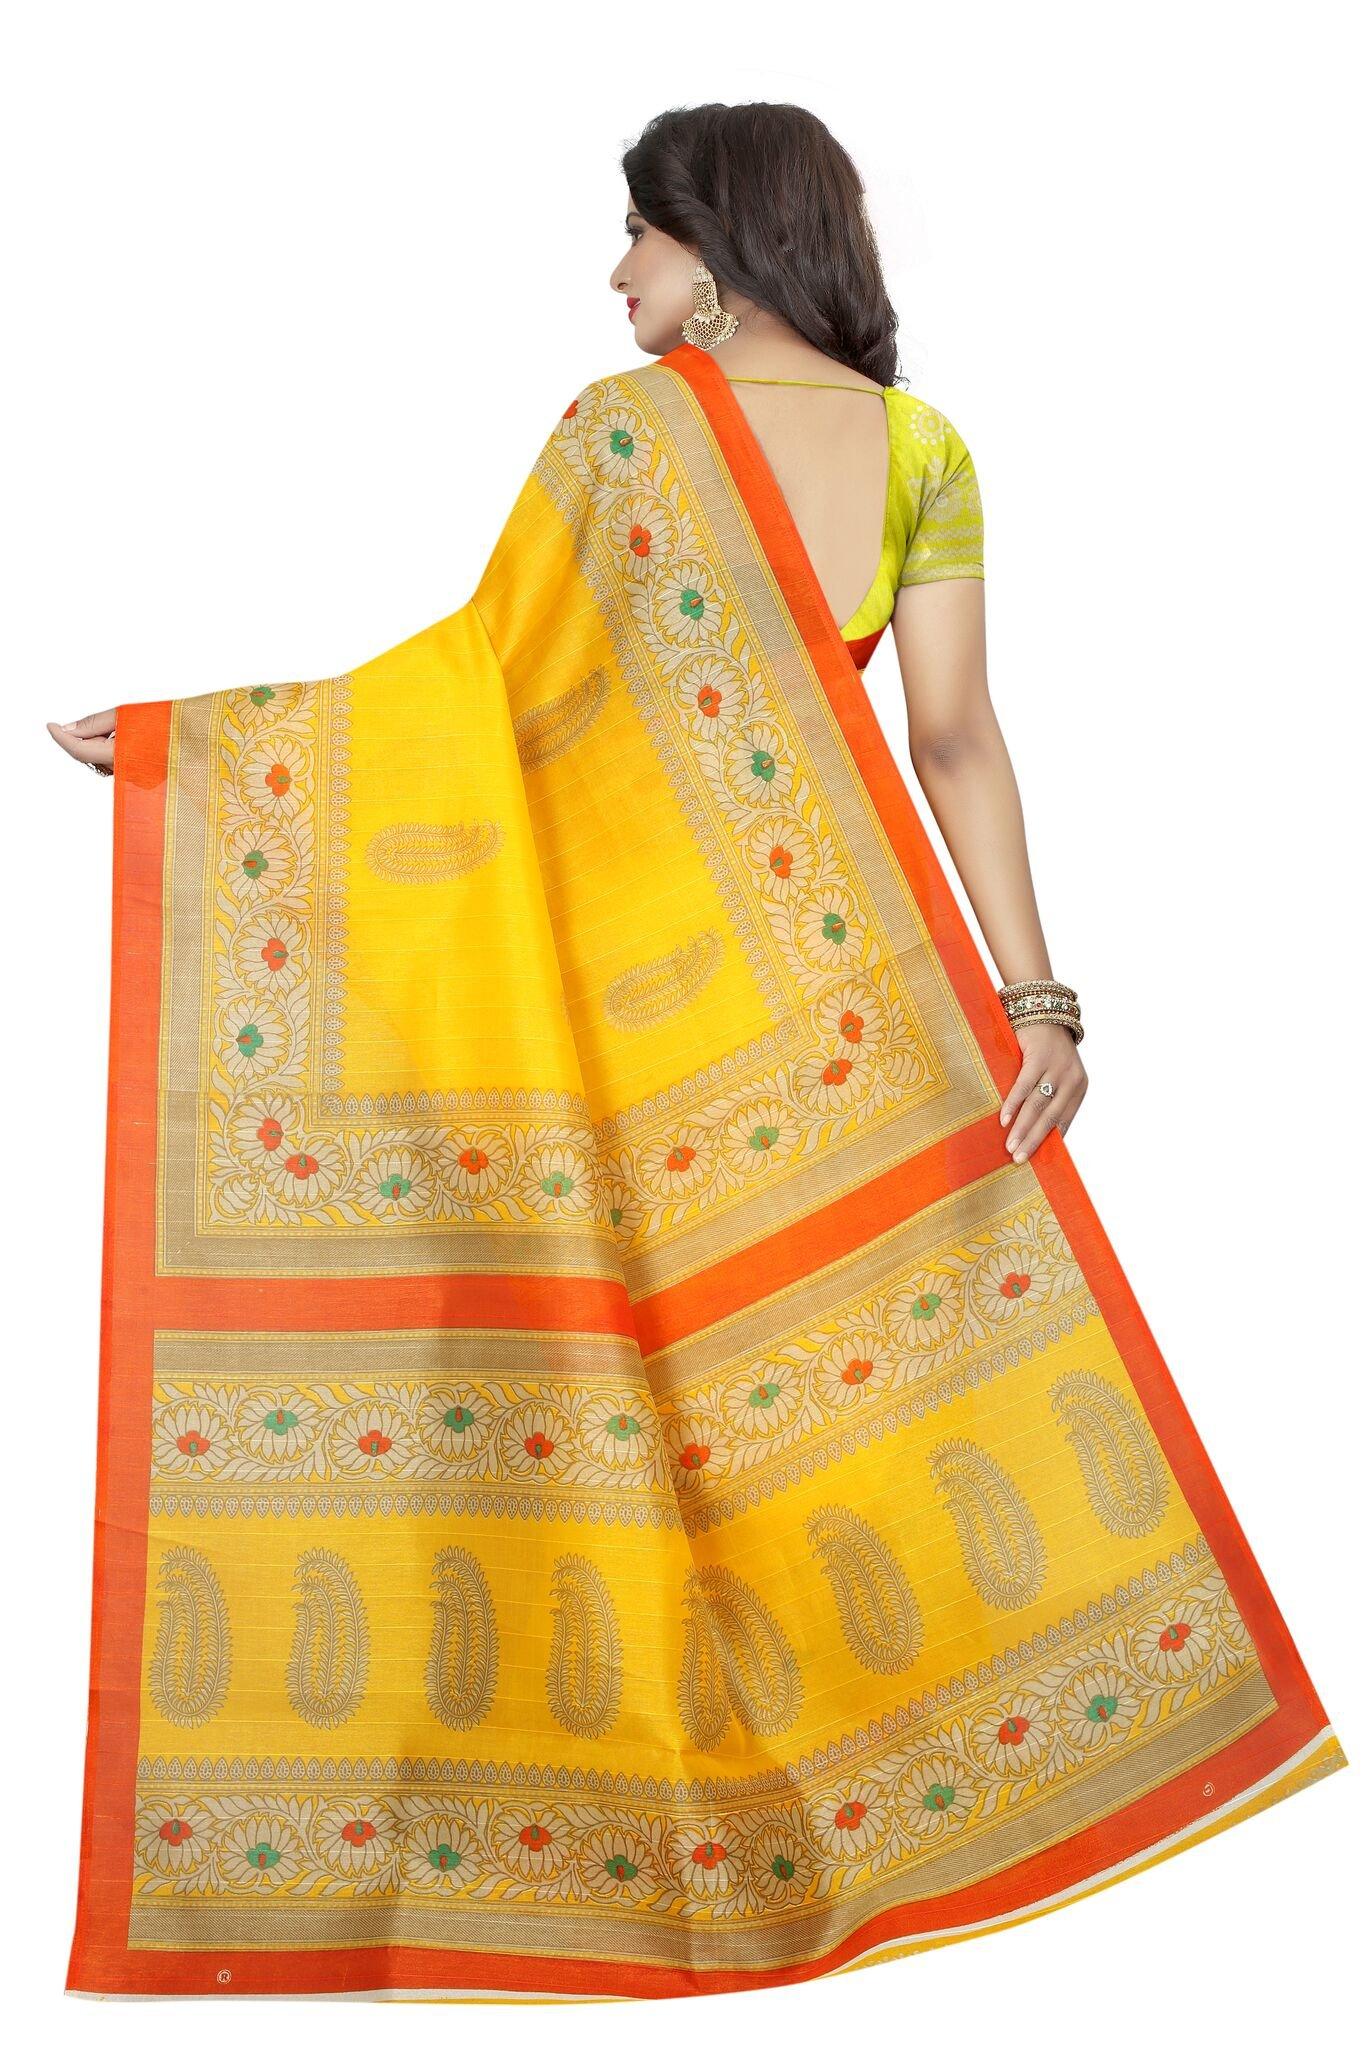 Shonaya Women`S Bhagalpuri Silk Printed Saree with Unstitched Blouse Piece (Yellow) by Shonaya (Image #4)